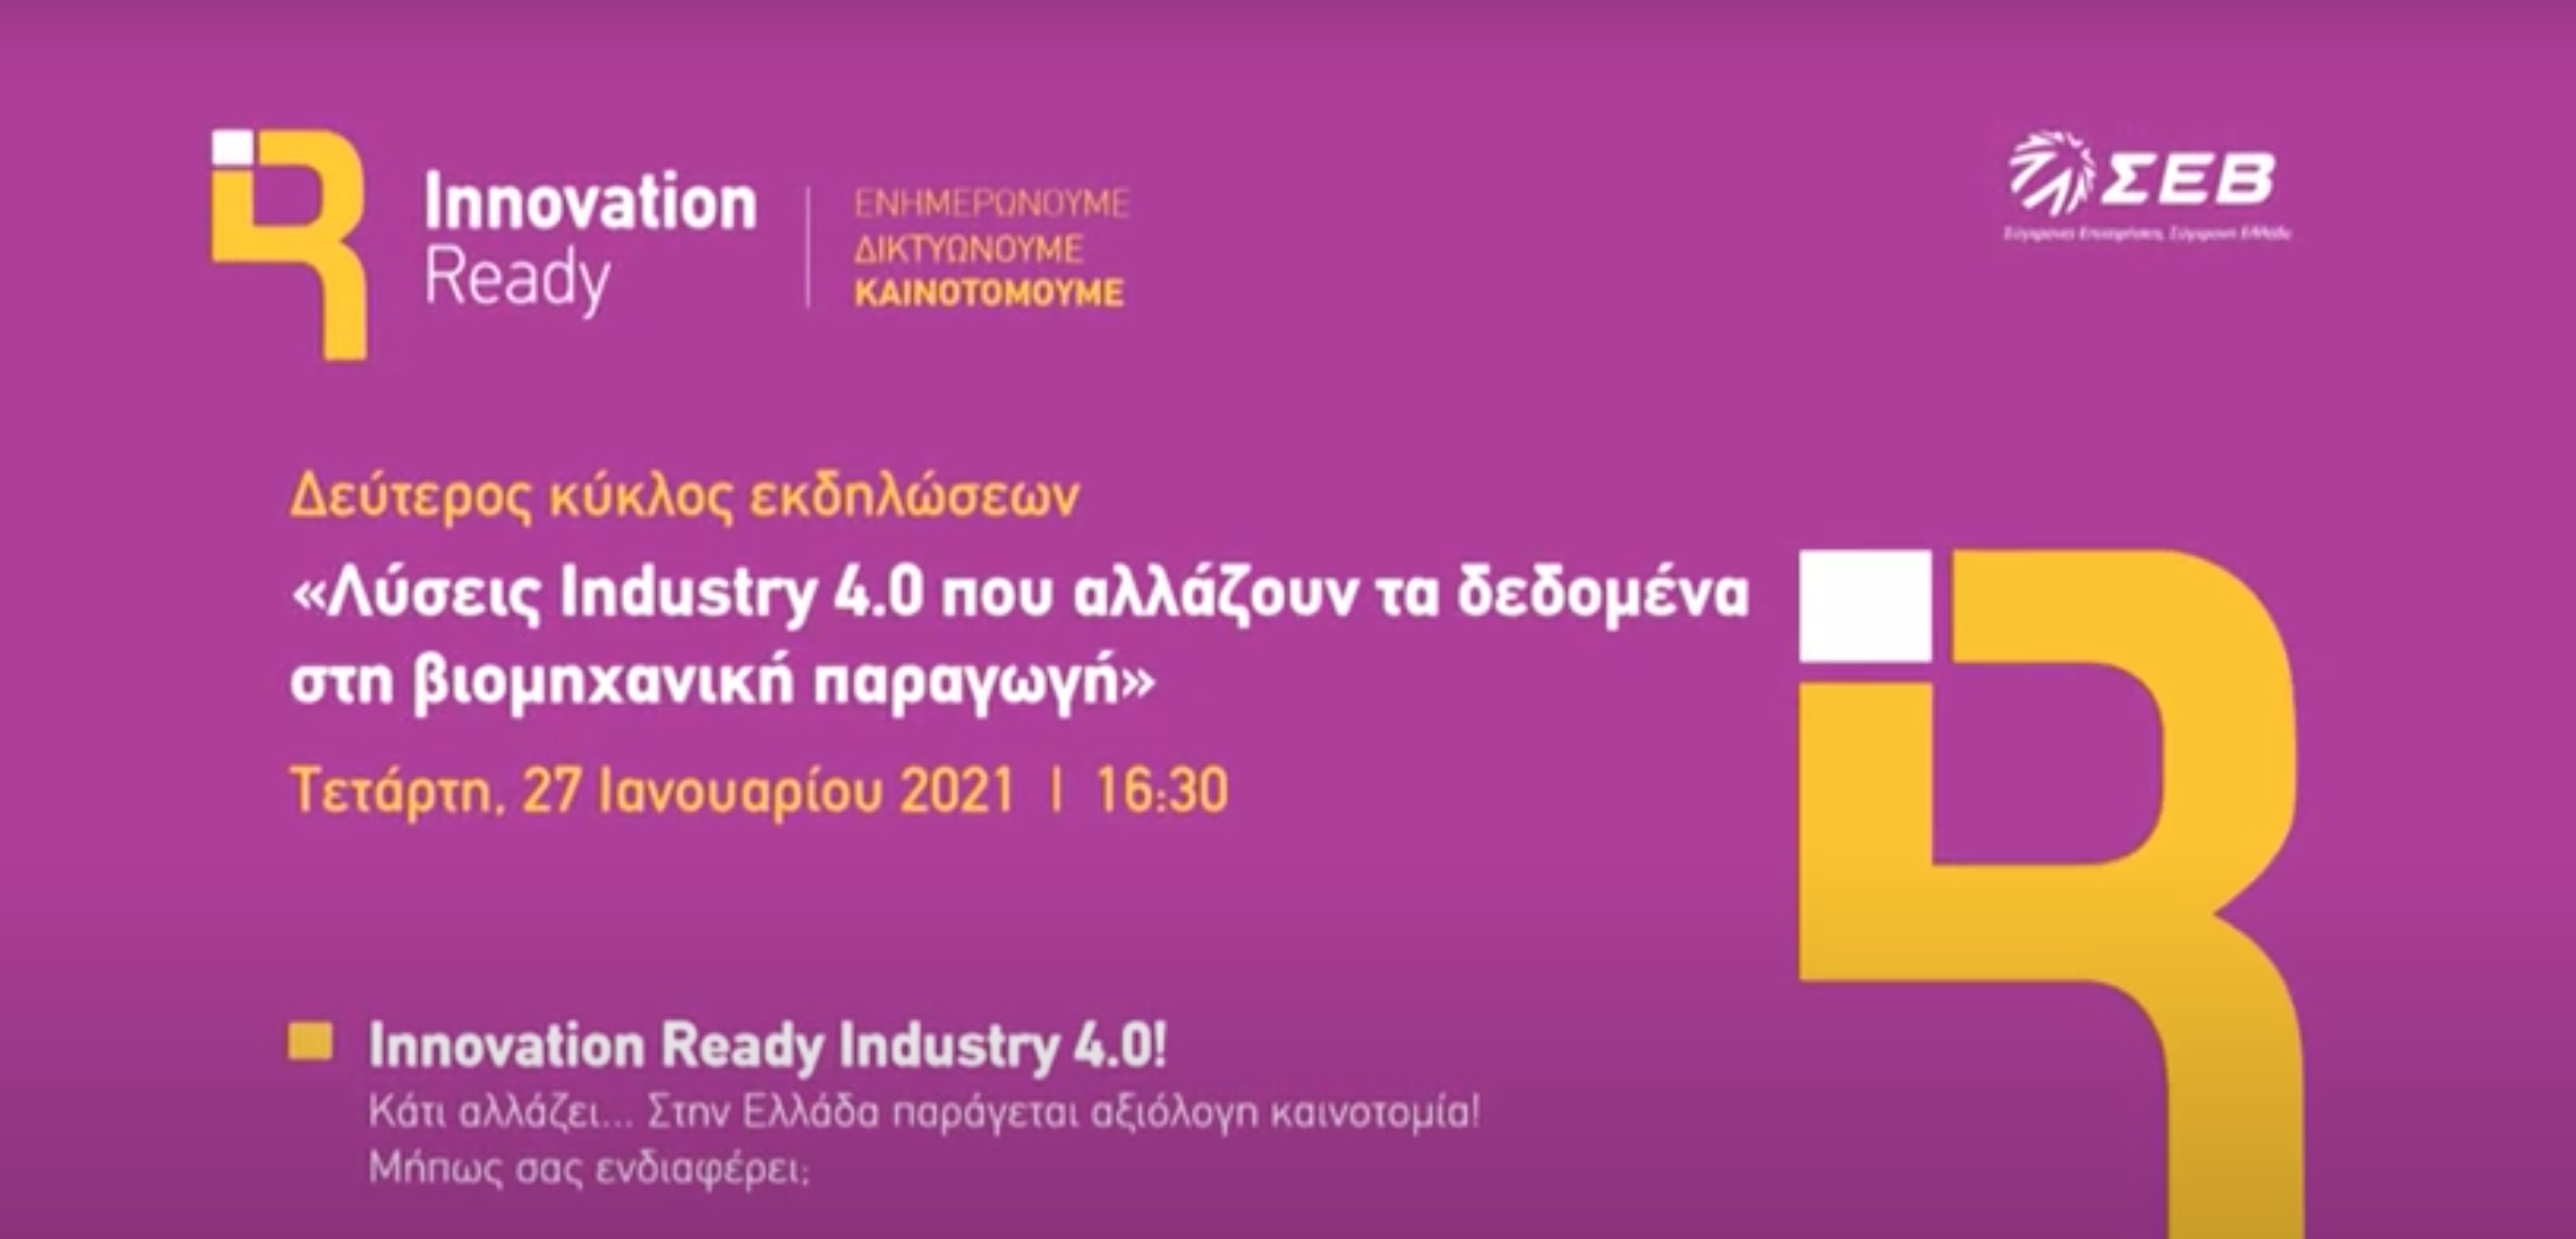 Newmoney.gr: Πρωτοβουλία ΣΕΒ Innovation Ready, Nεοφυείς επιχειρήσεις παρουσίασαν καινοτόμα προϊόντα τους